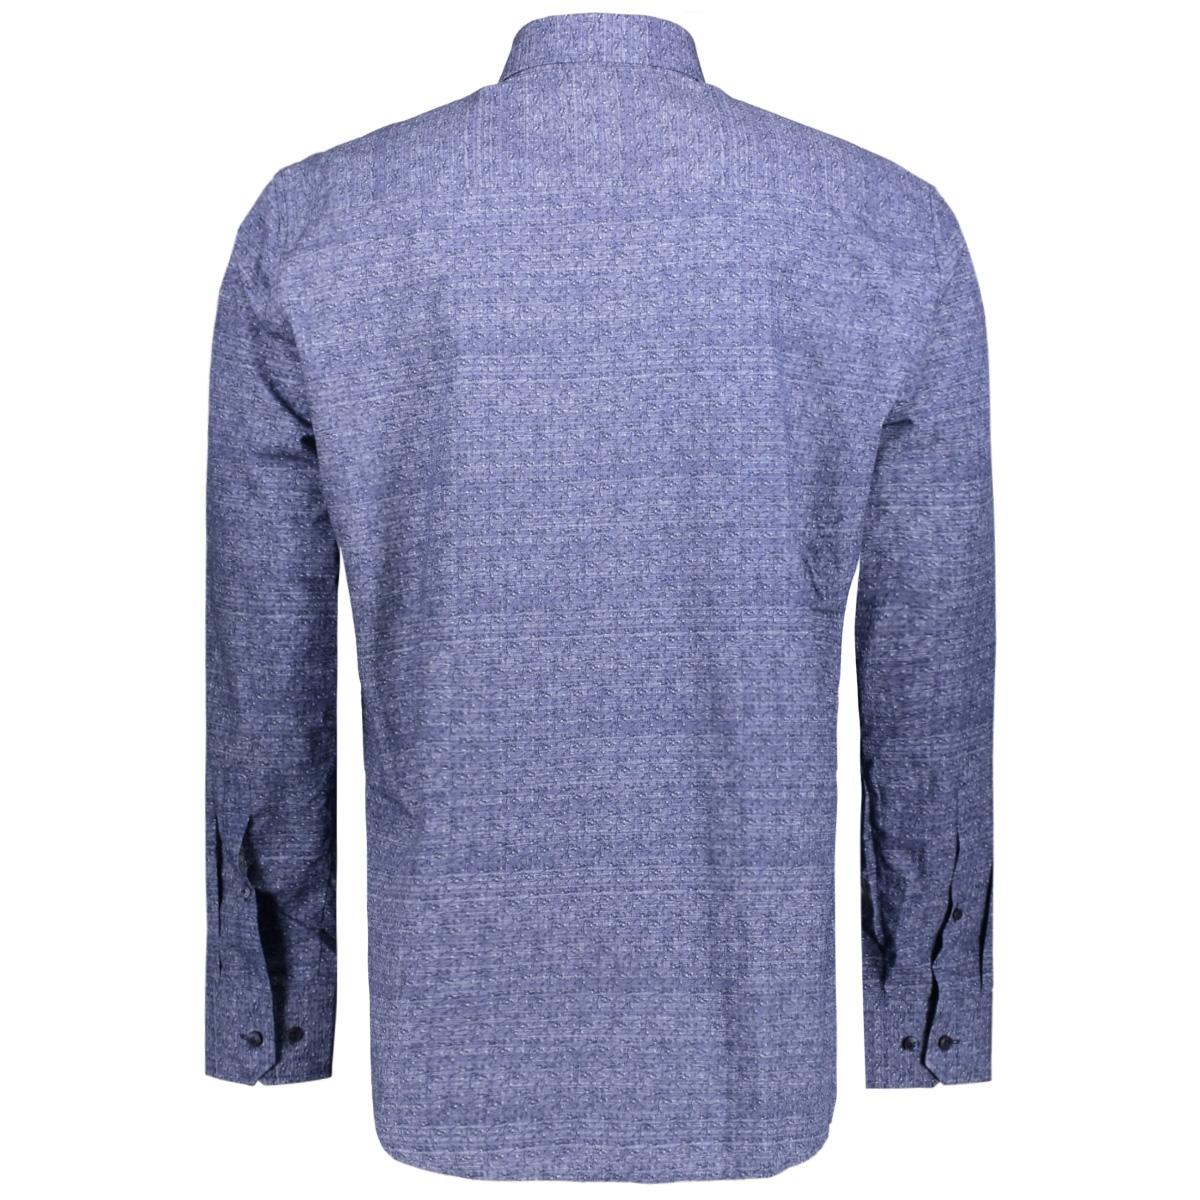 3250 7003 haupt overhemd 01